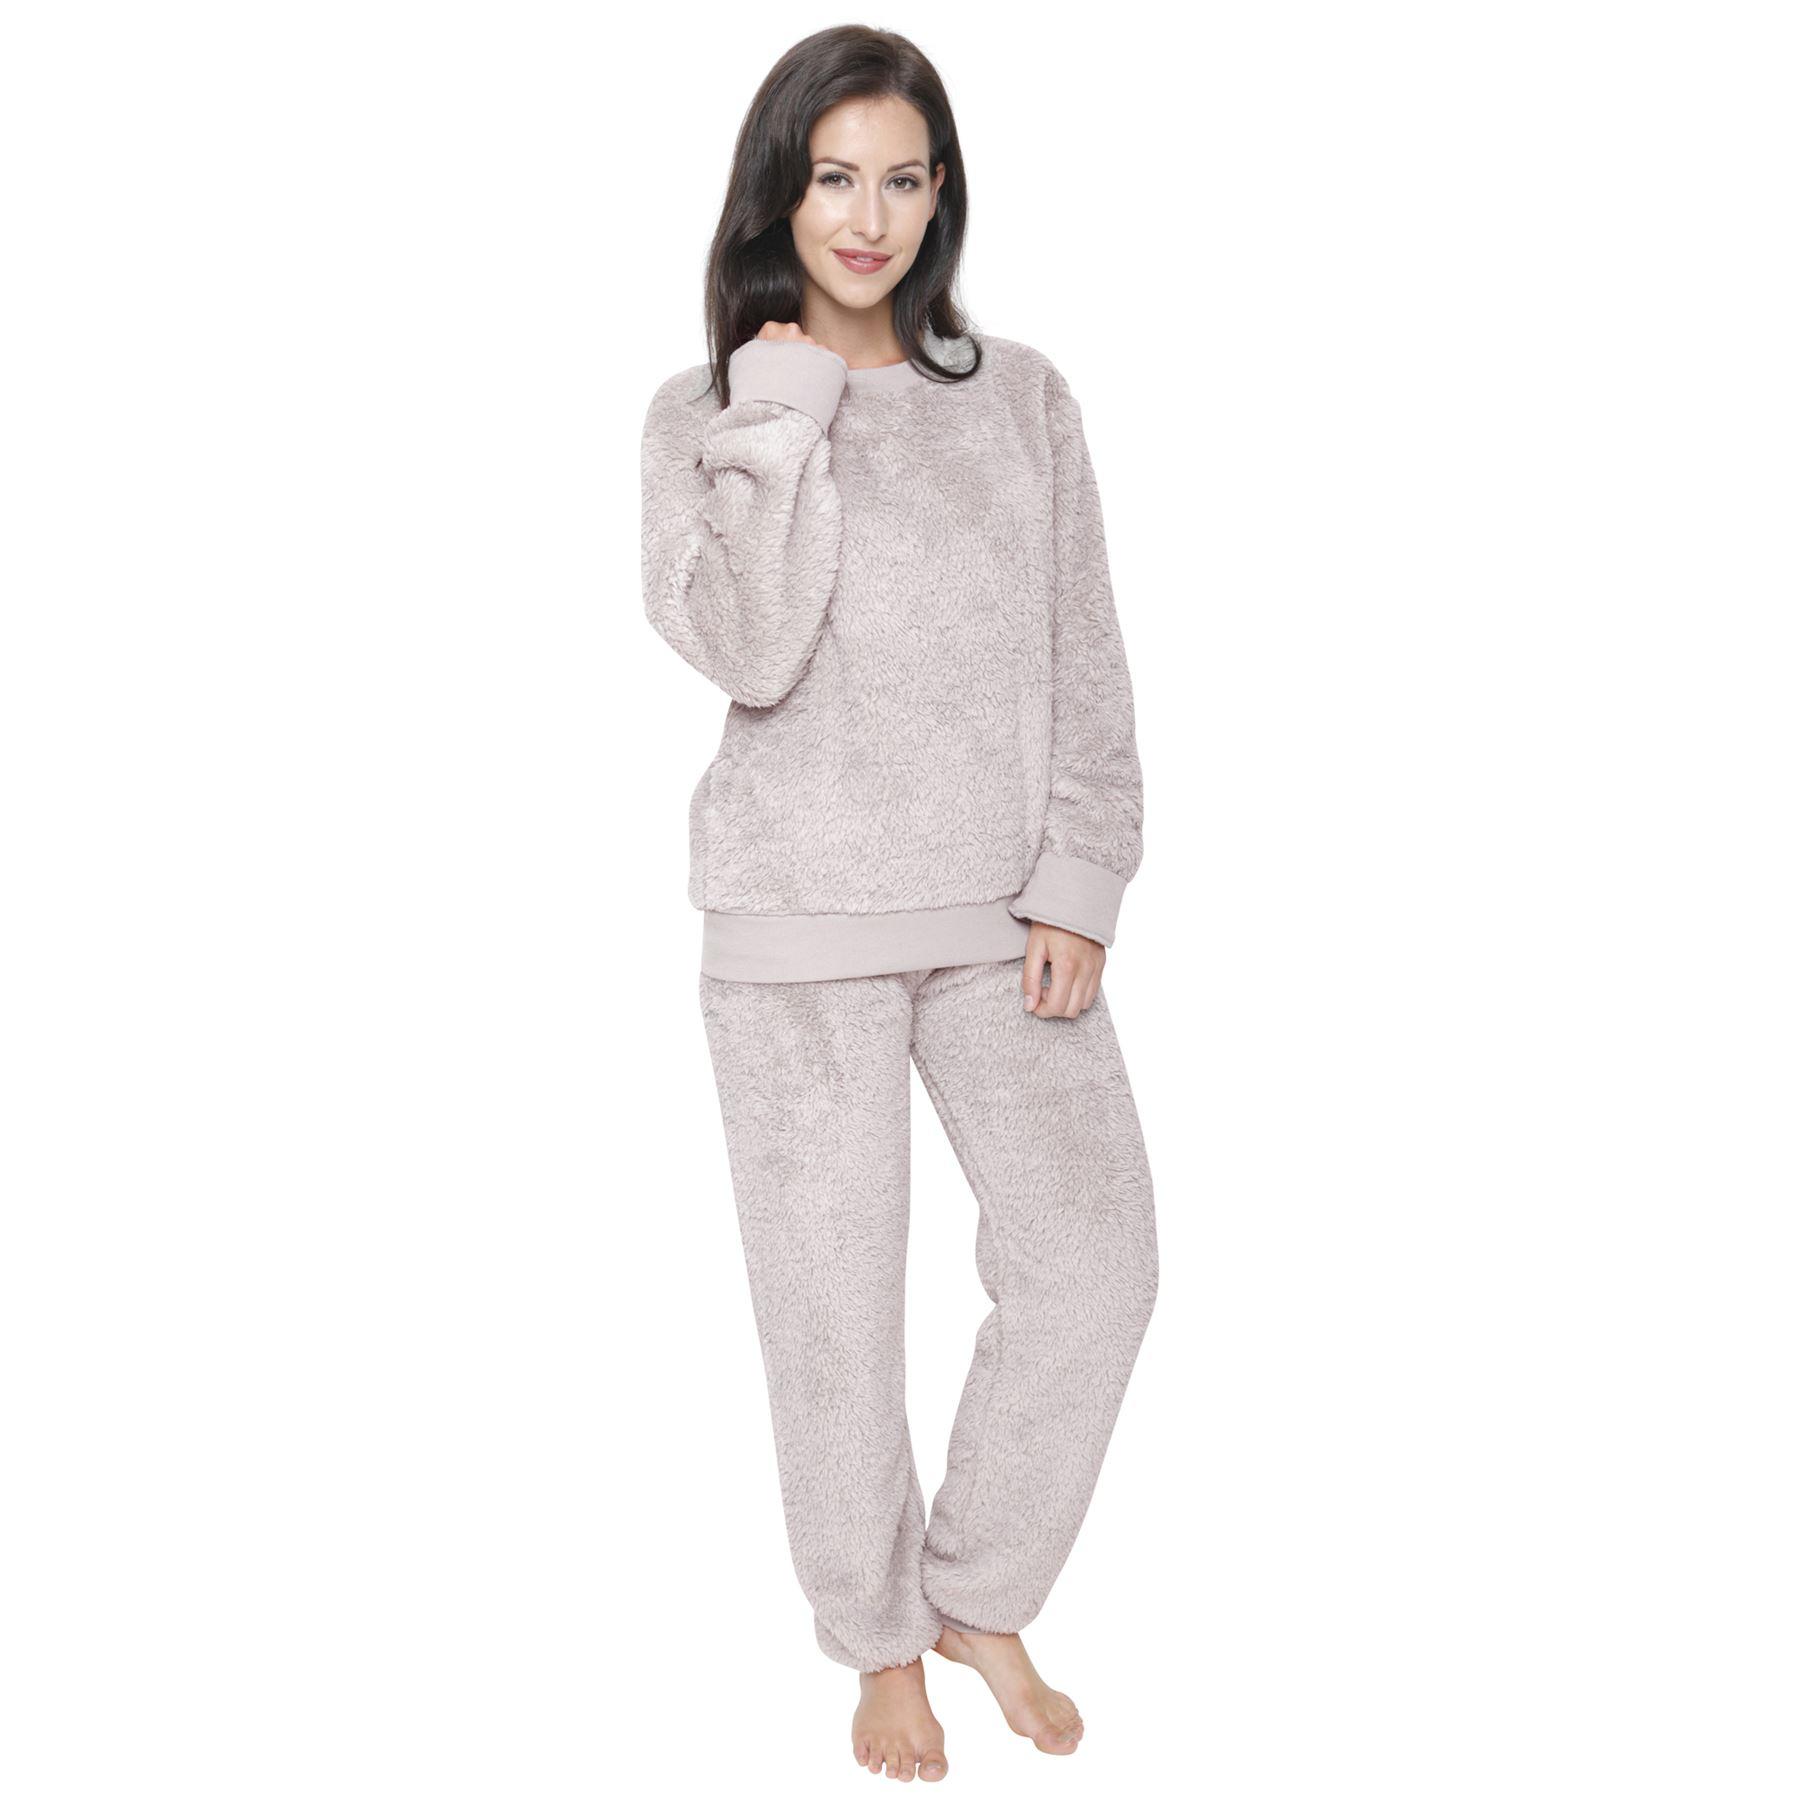 femmes blottir pyjama polaire chaud doux pyjama ensemble v tement de d tente ebay. Black Bedroom Furniture Sets. Home Design Ideas